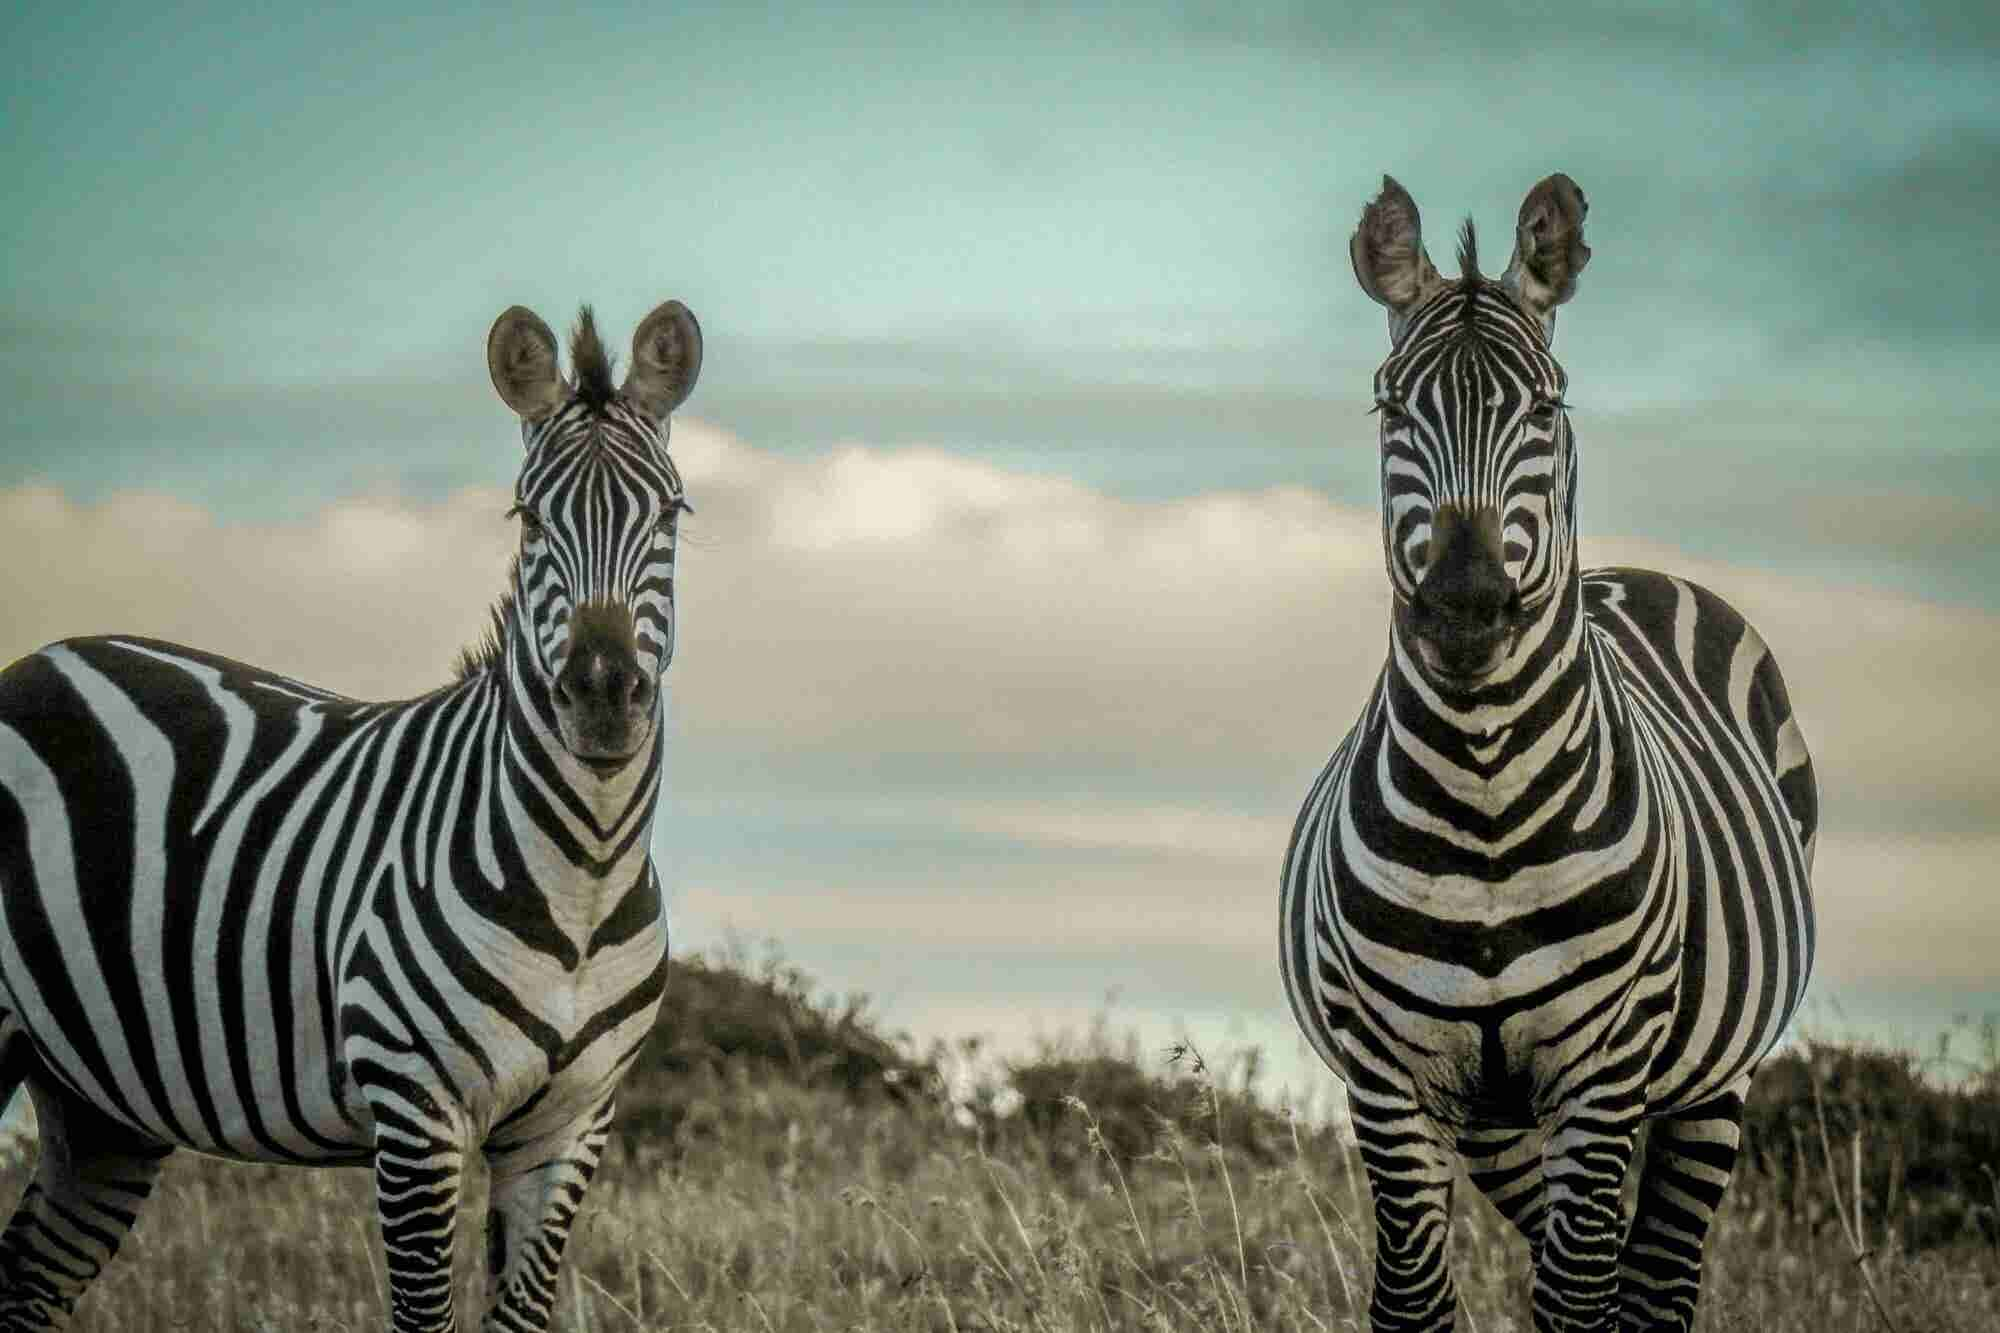 Forget Unicorns. We Need More 'Zebra' Startups.